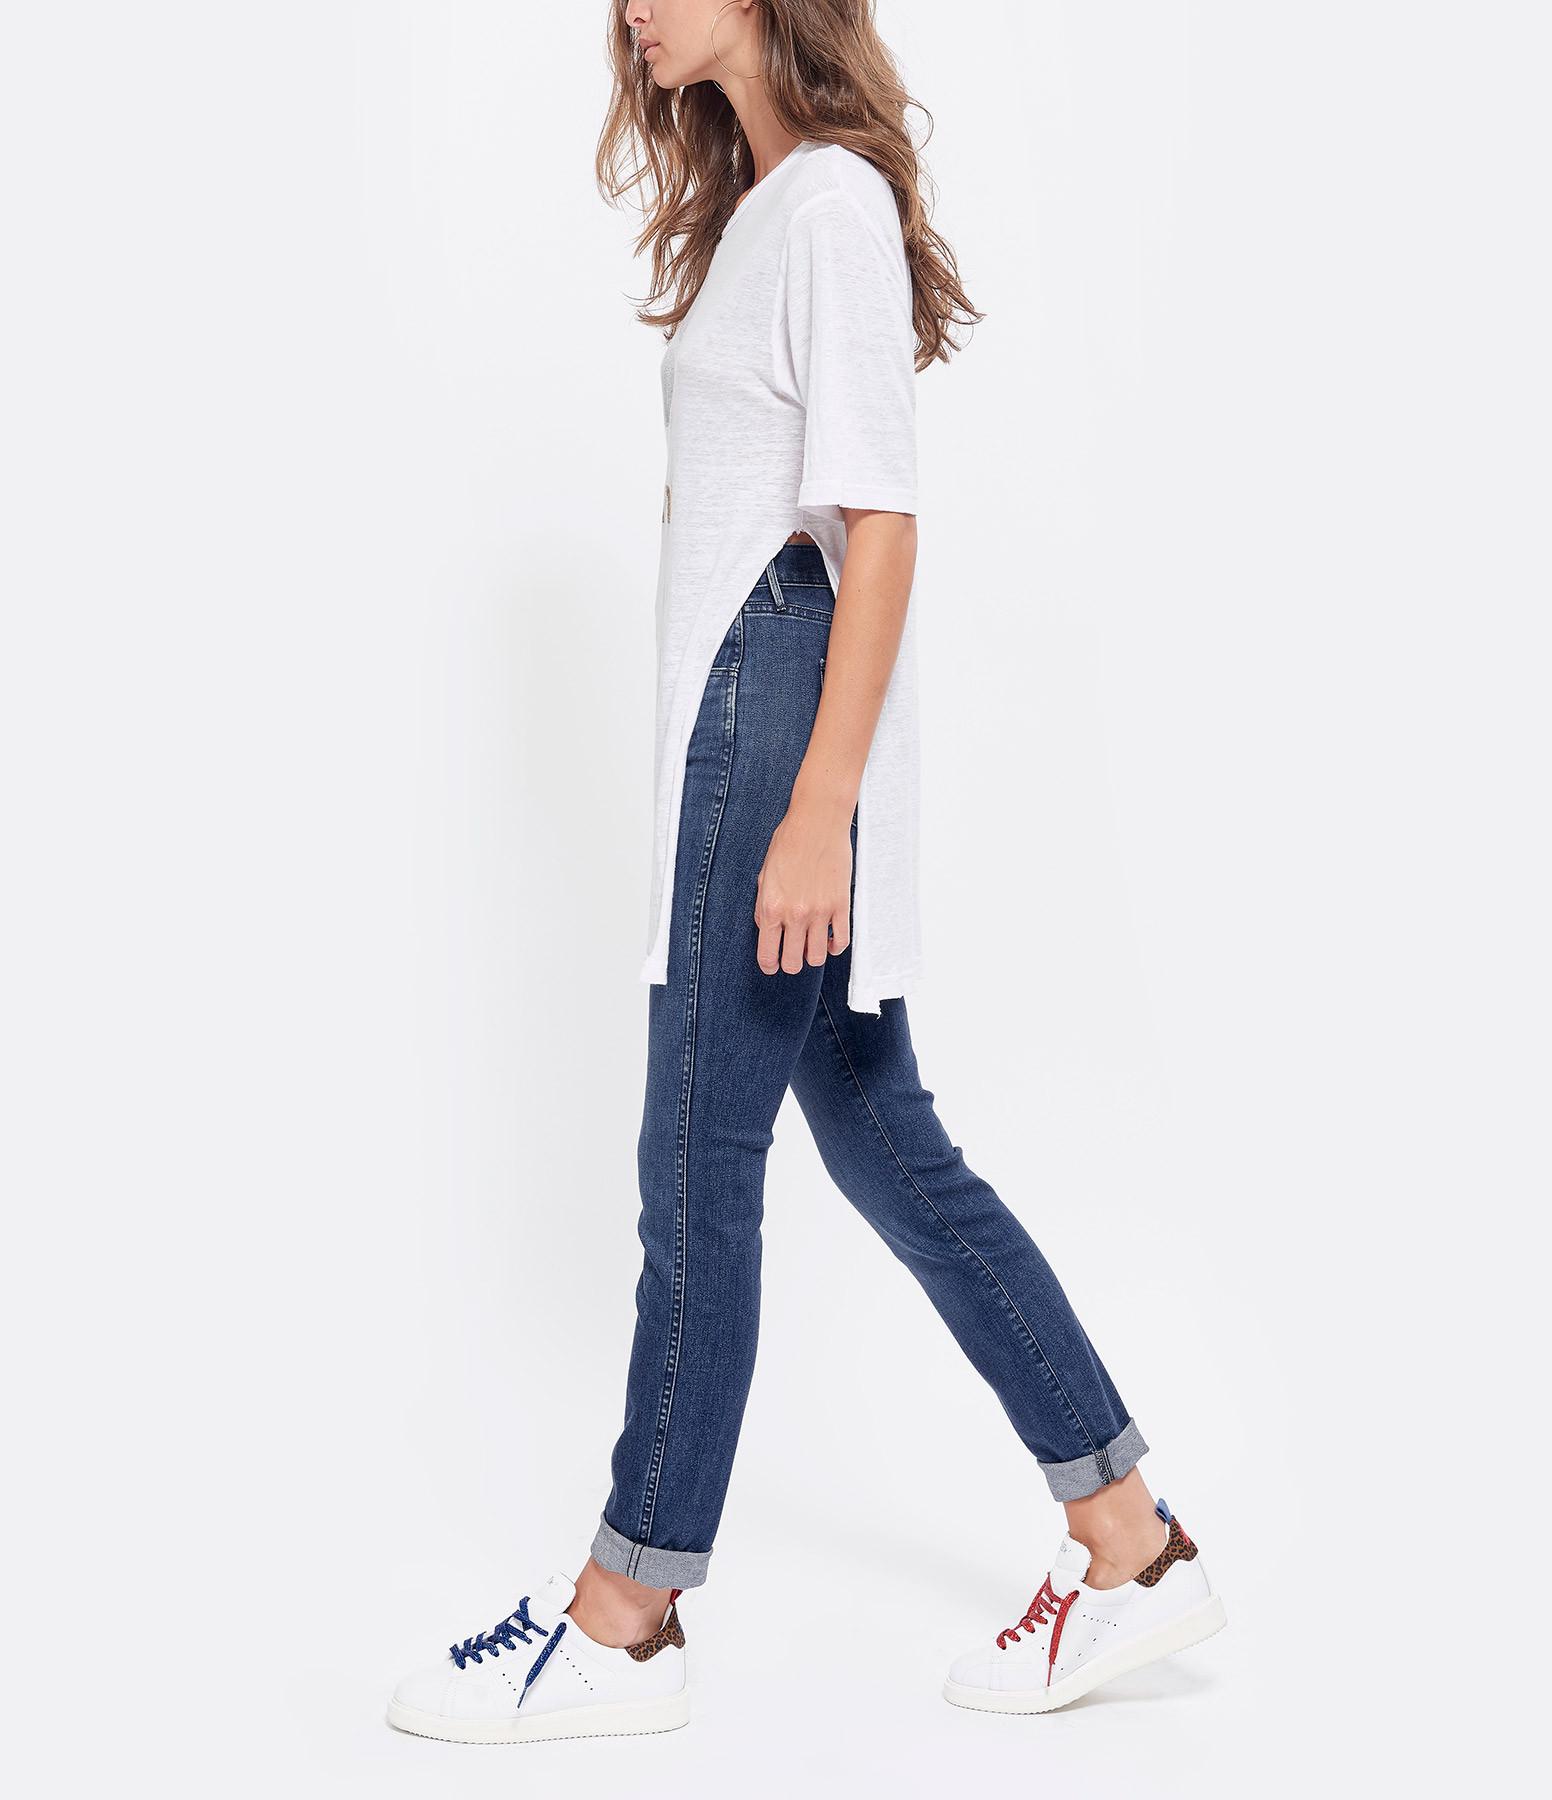 ISABEL MARANT ÉTOILE - Tee-shirt Kuta Coton Blanc